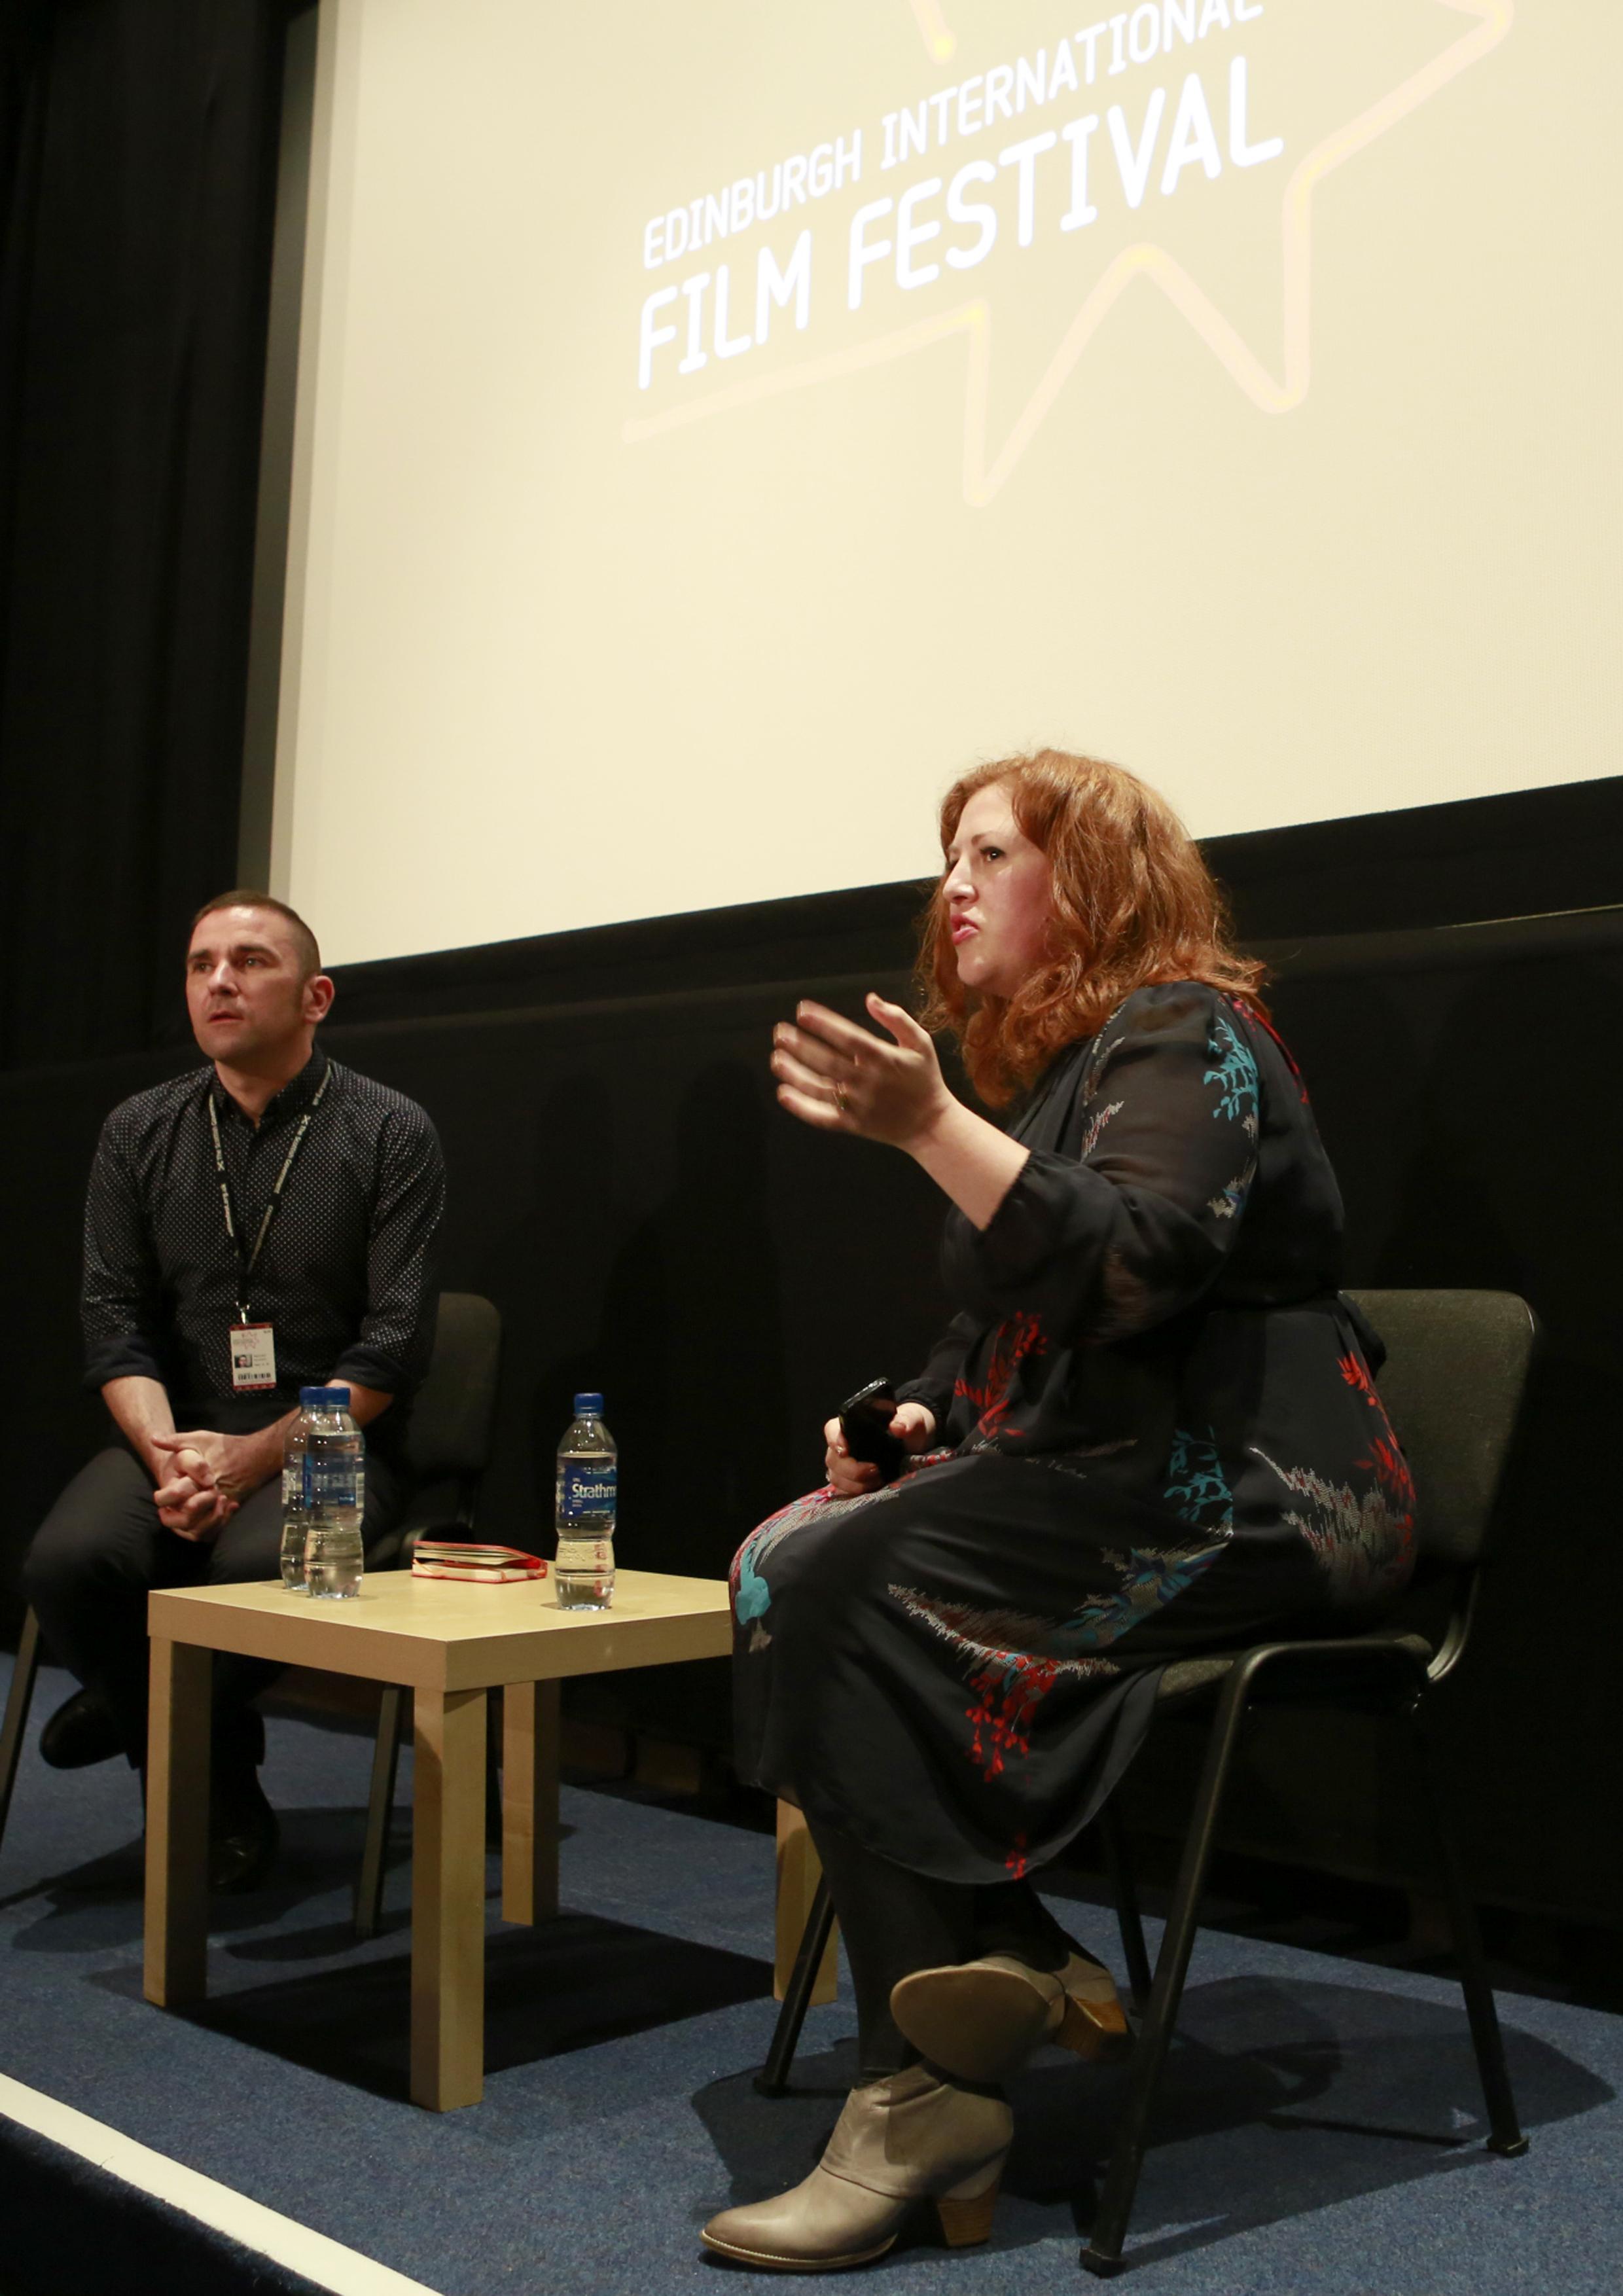 Masterclass at Edinburgh International Film Festival